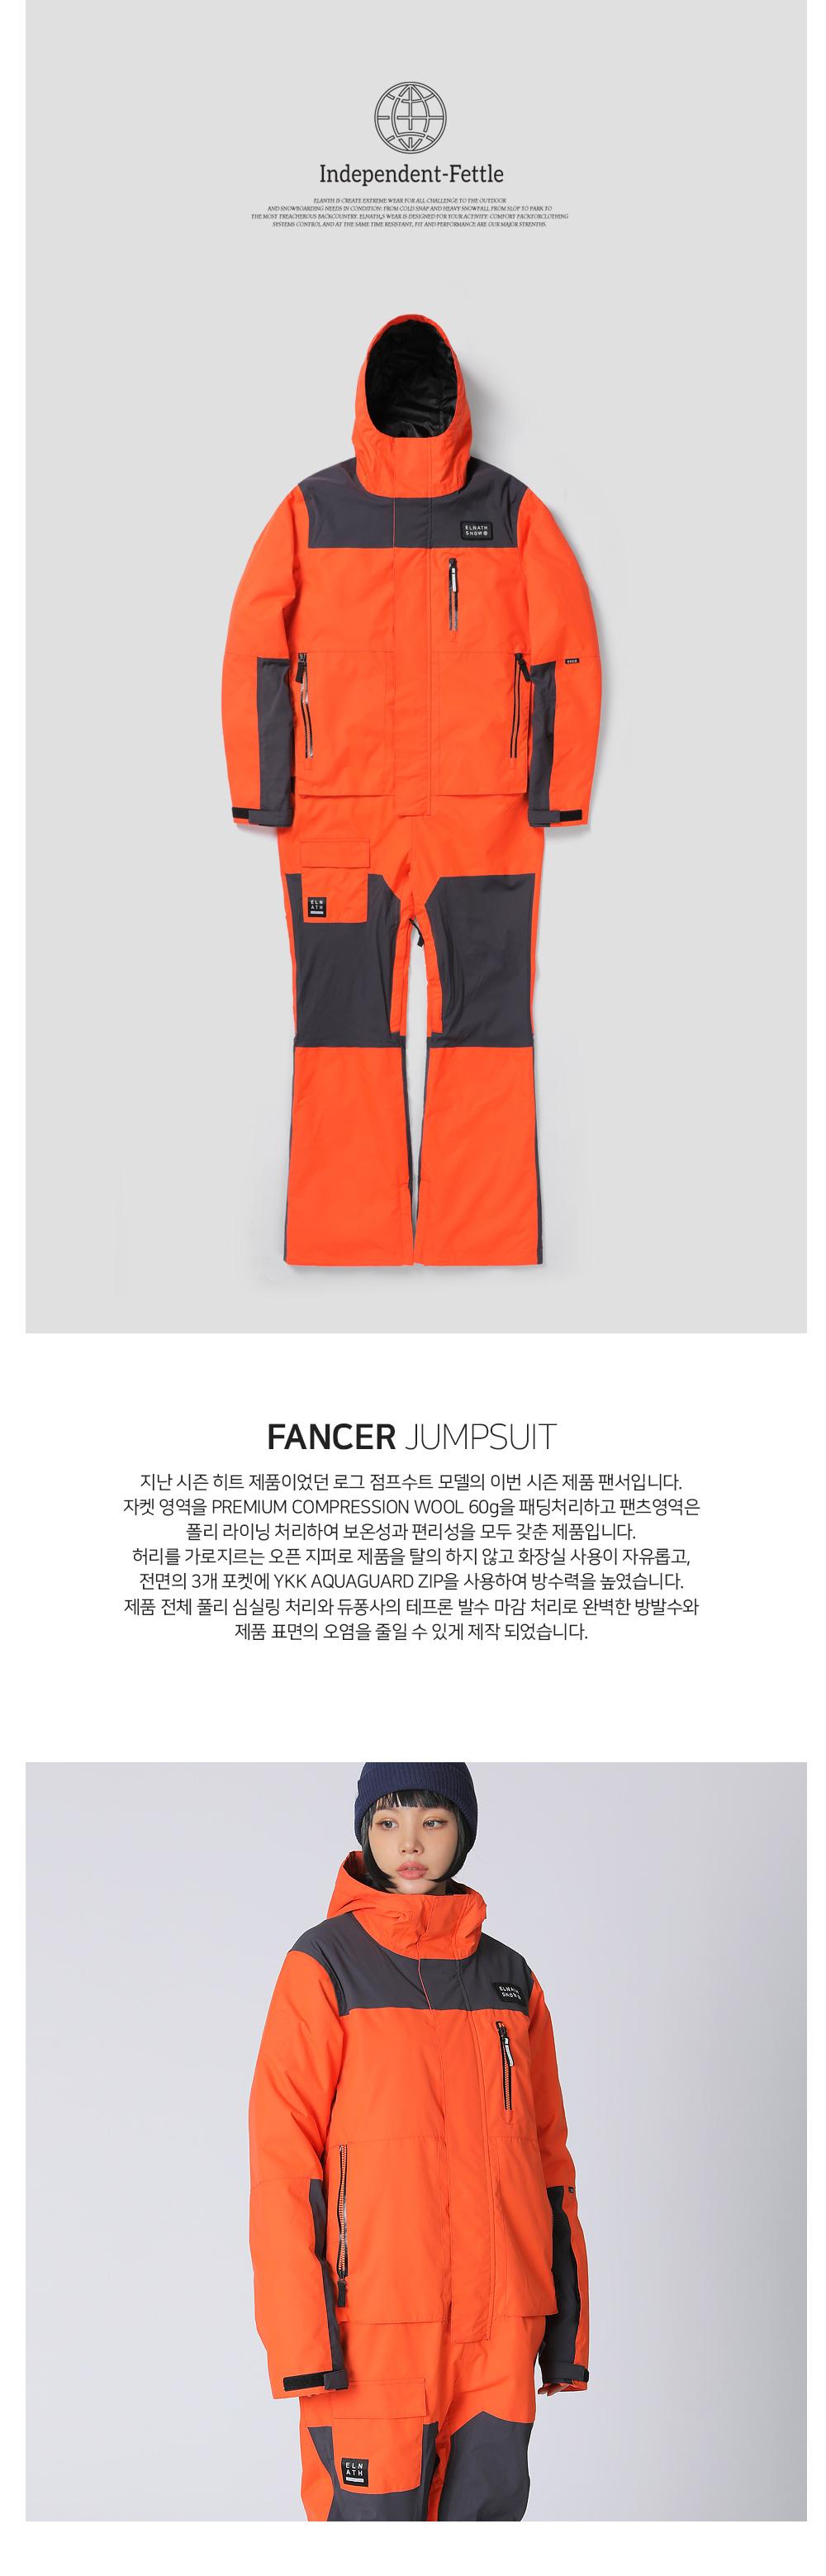 suit_fancer_mandarin_d1.jpg